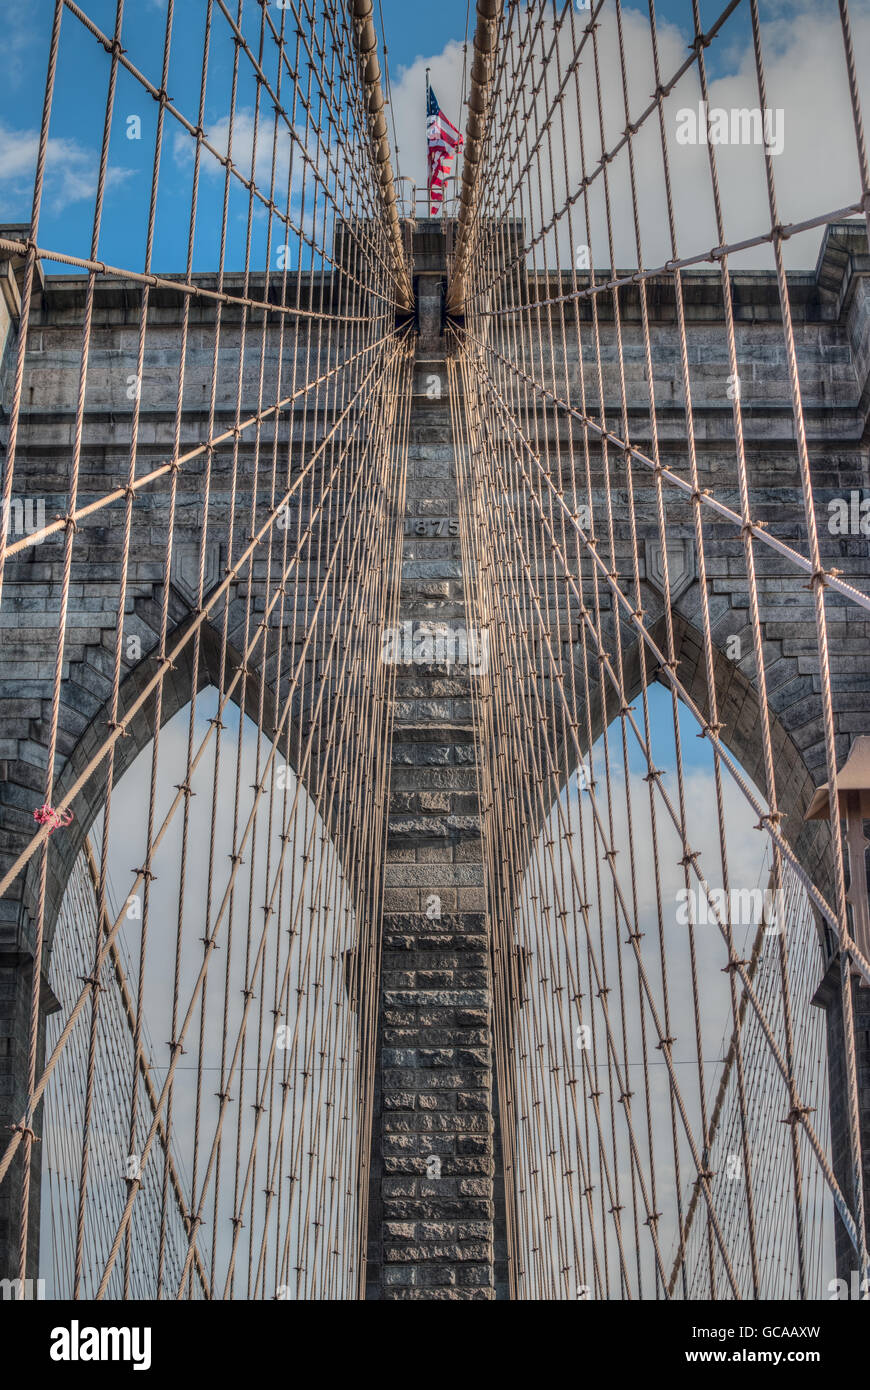 Detail der Brooklyn Bridge, New York City, New York Stockbild